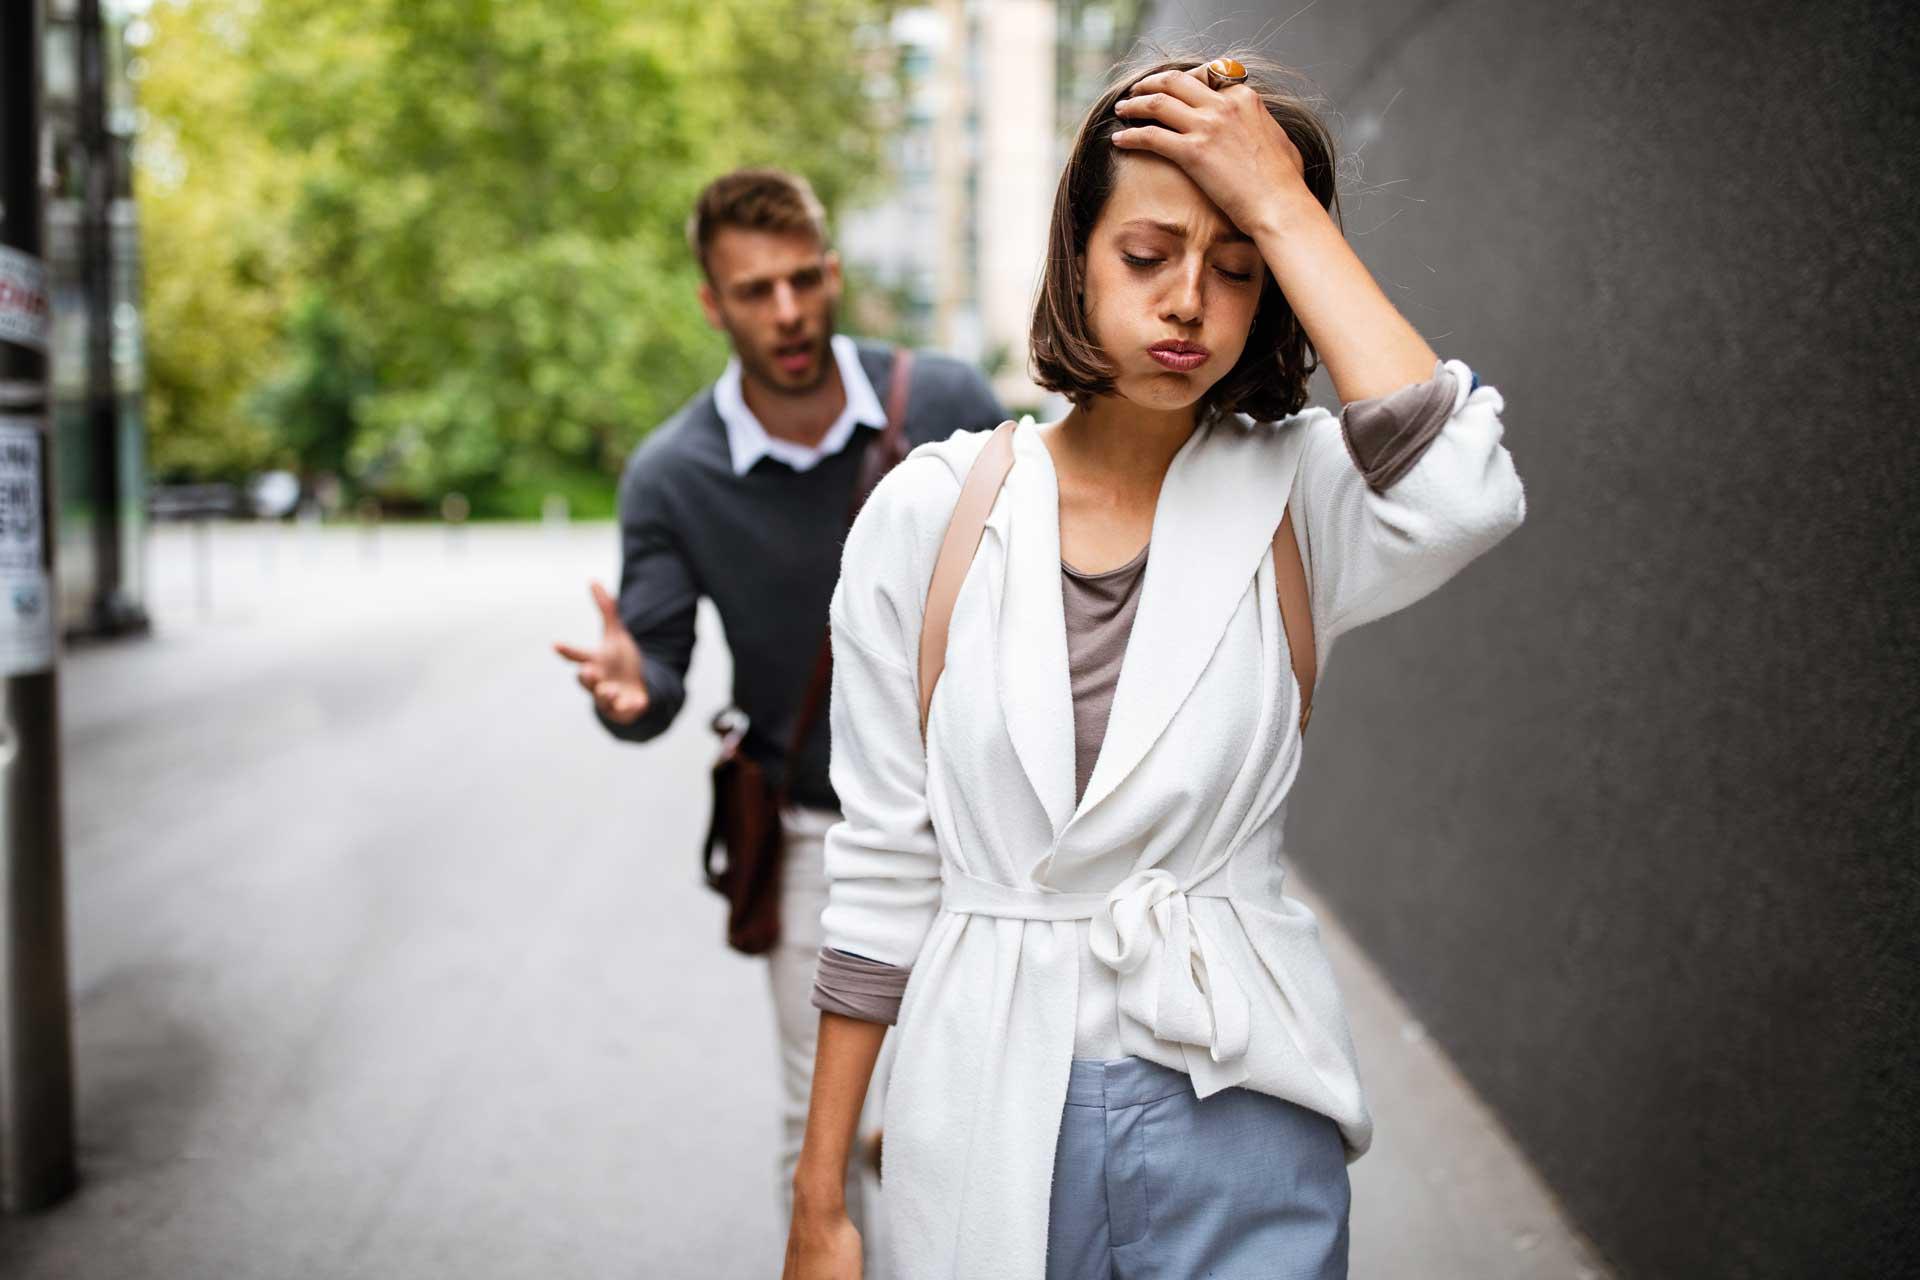 Becky-Lennox-Toxic-Relationships-Blog